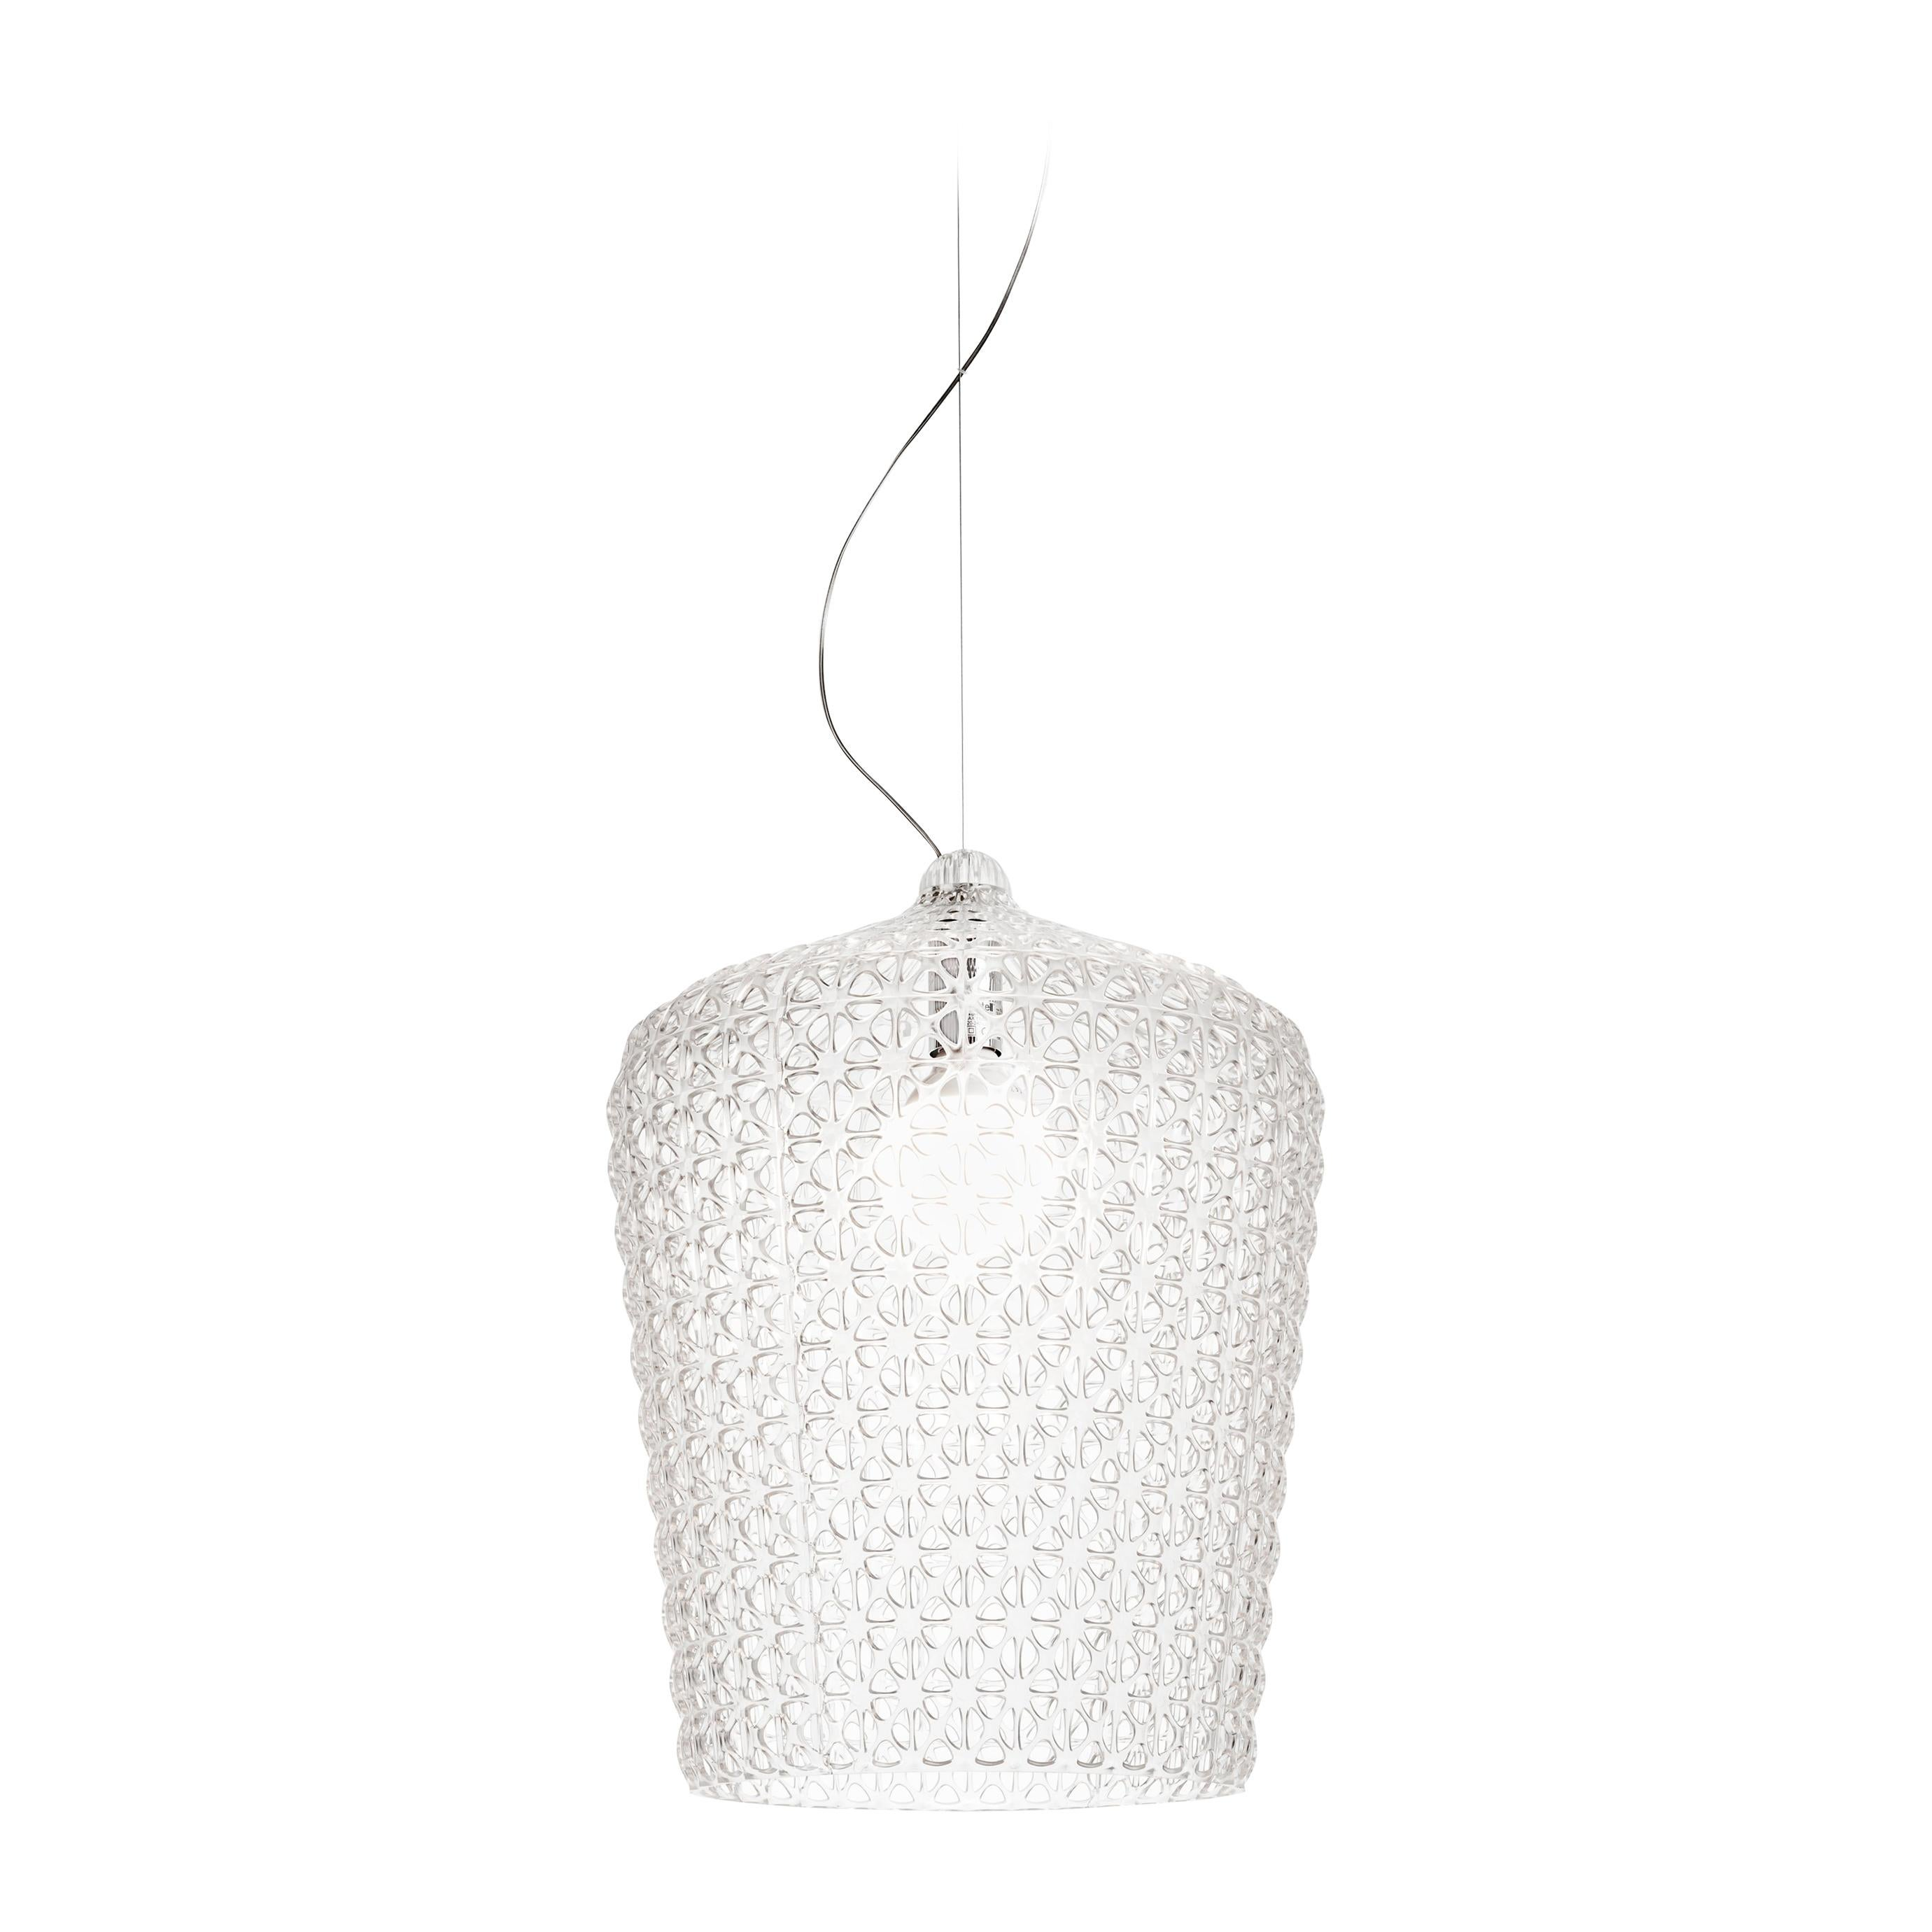 Kartell Kabuki Pendant Light in Crystal by Ferruccio Laviani